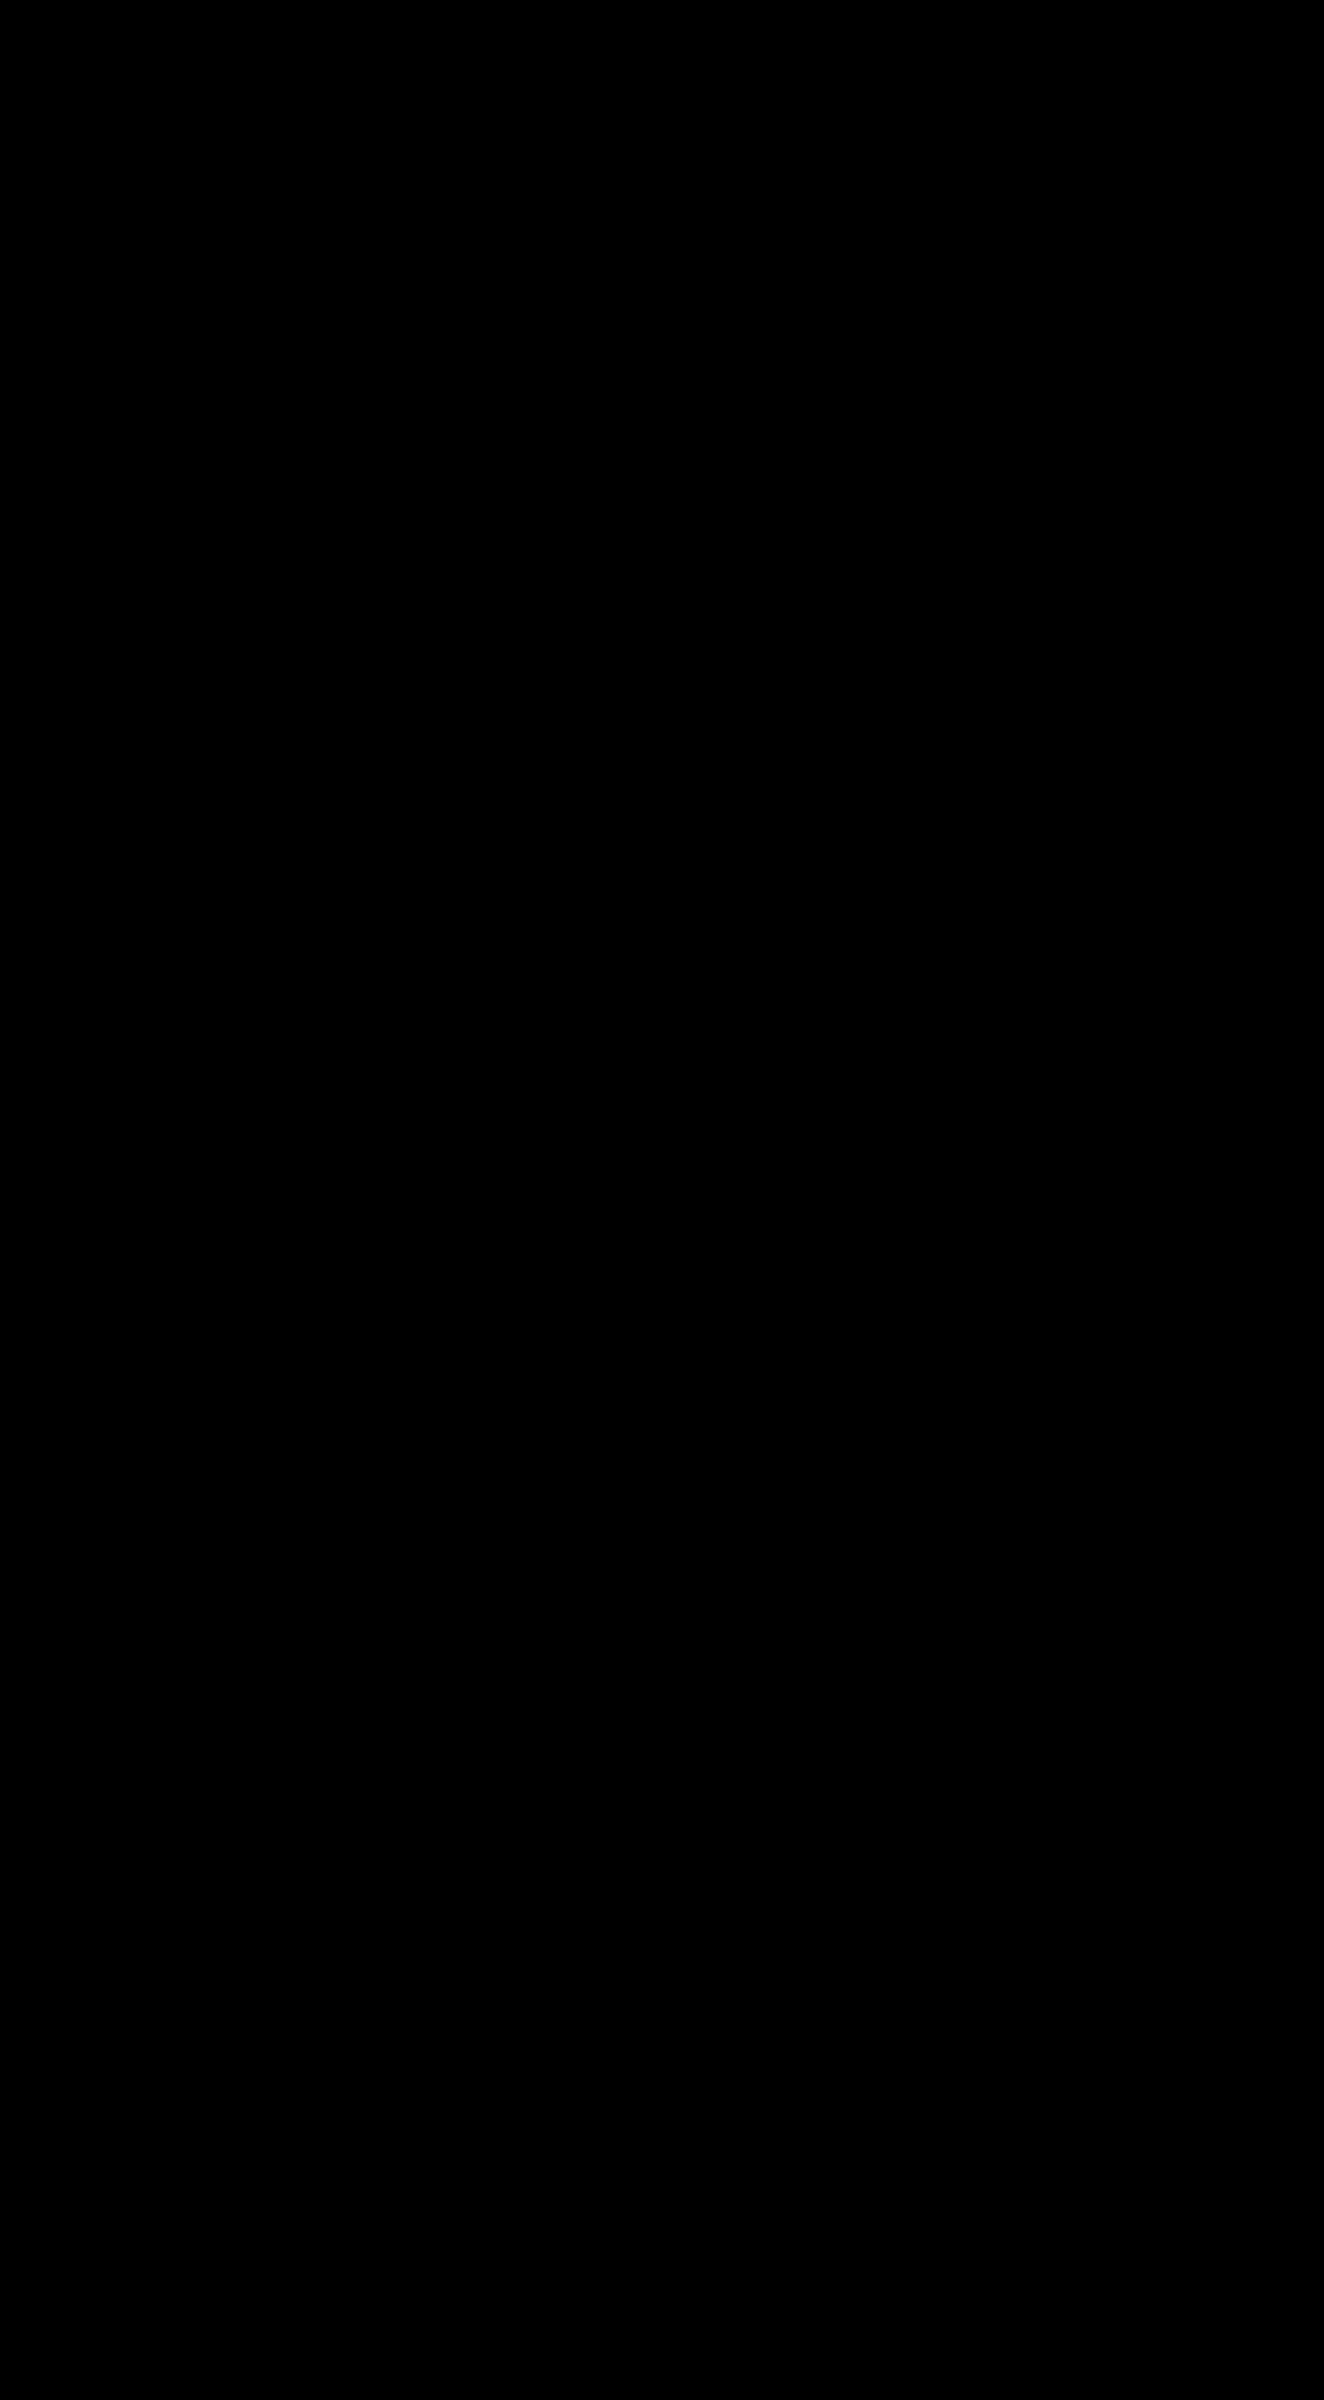 milk clipart logo